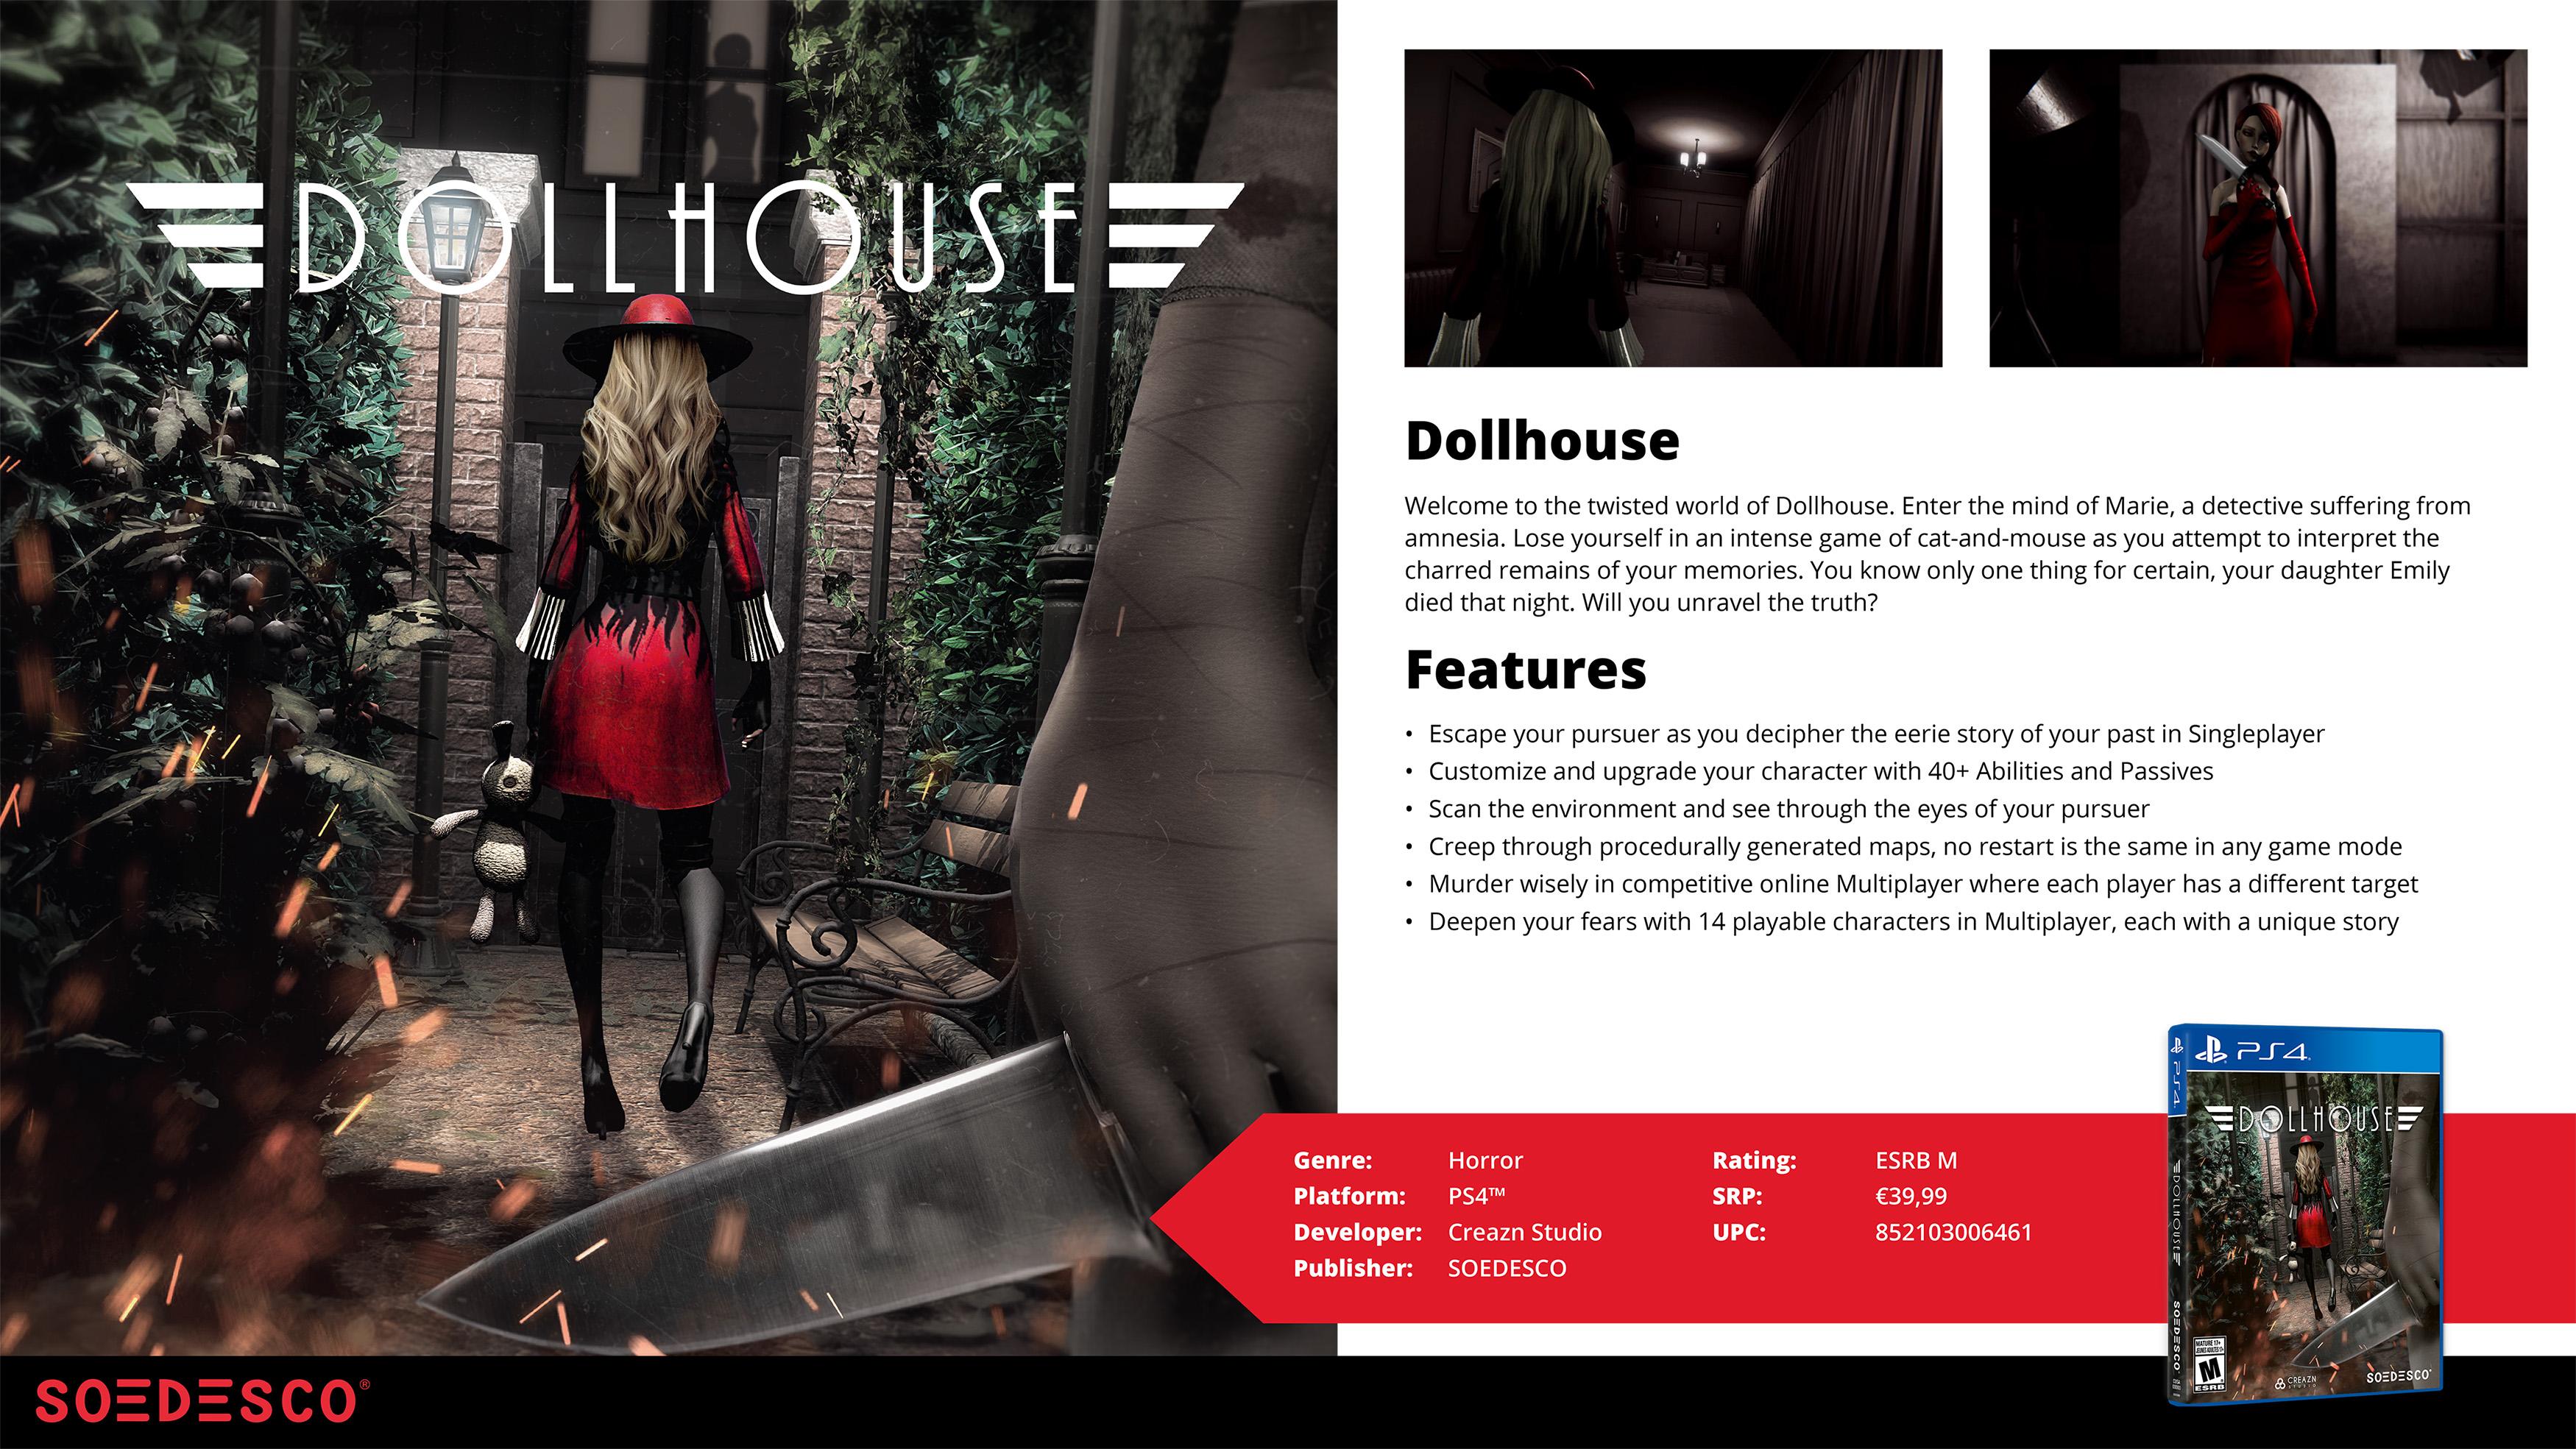 Dollhouse Fact Sheet